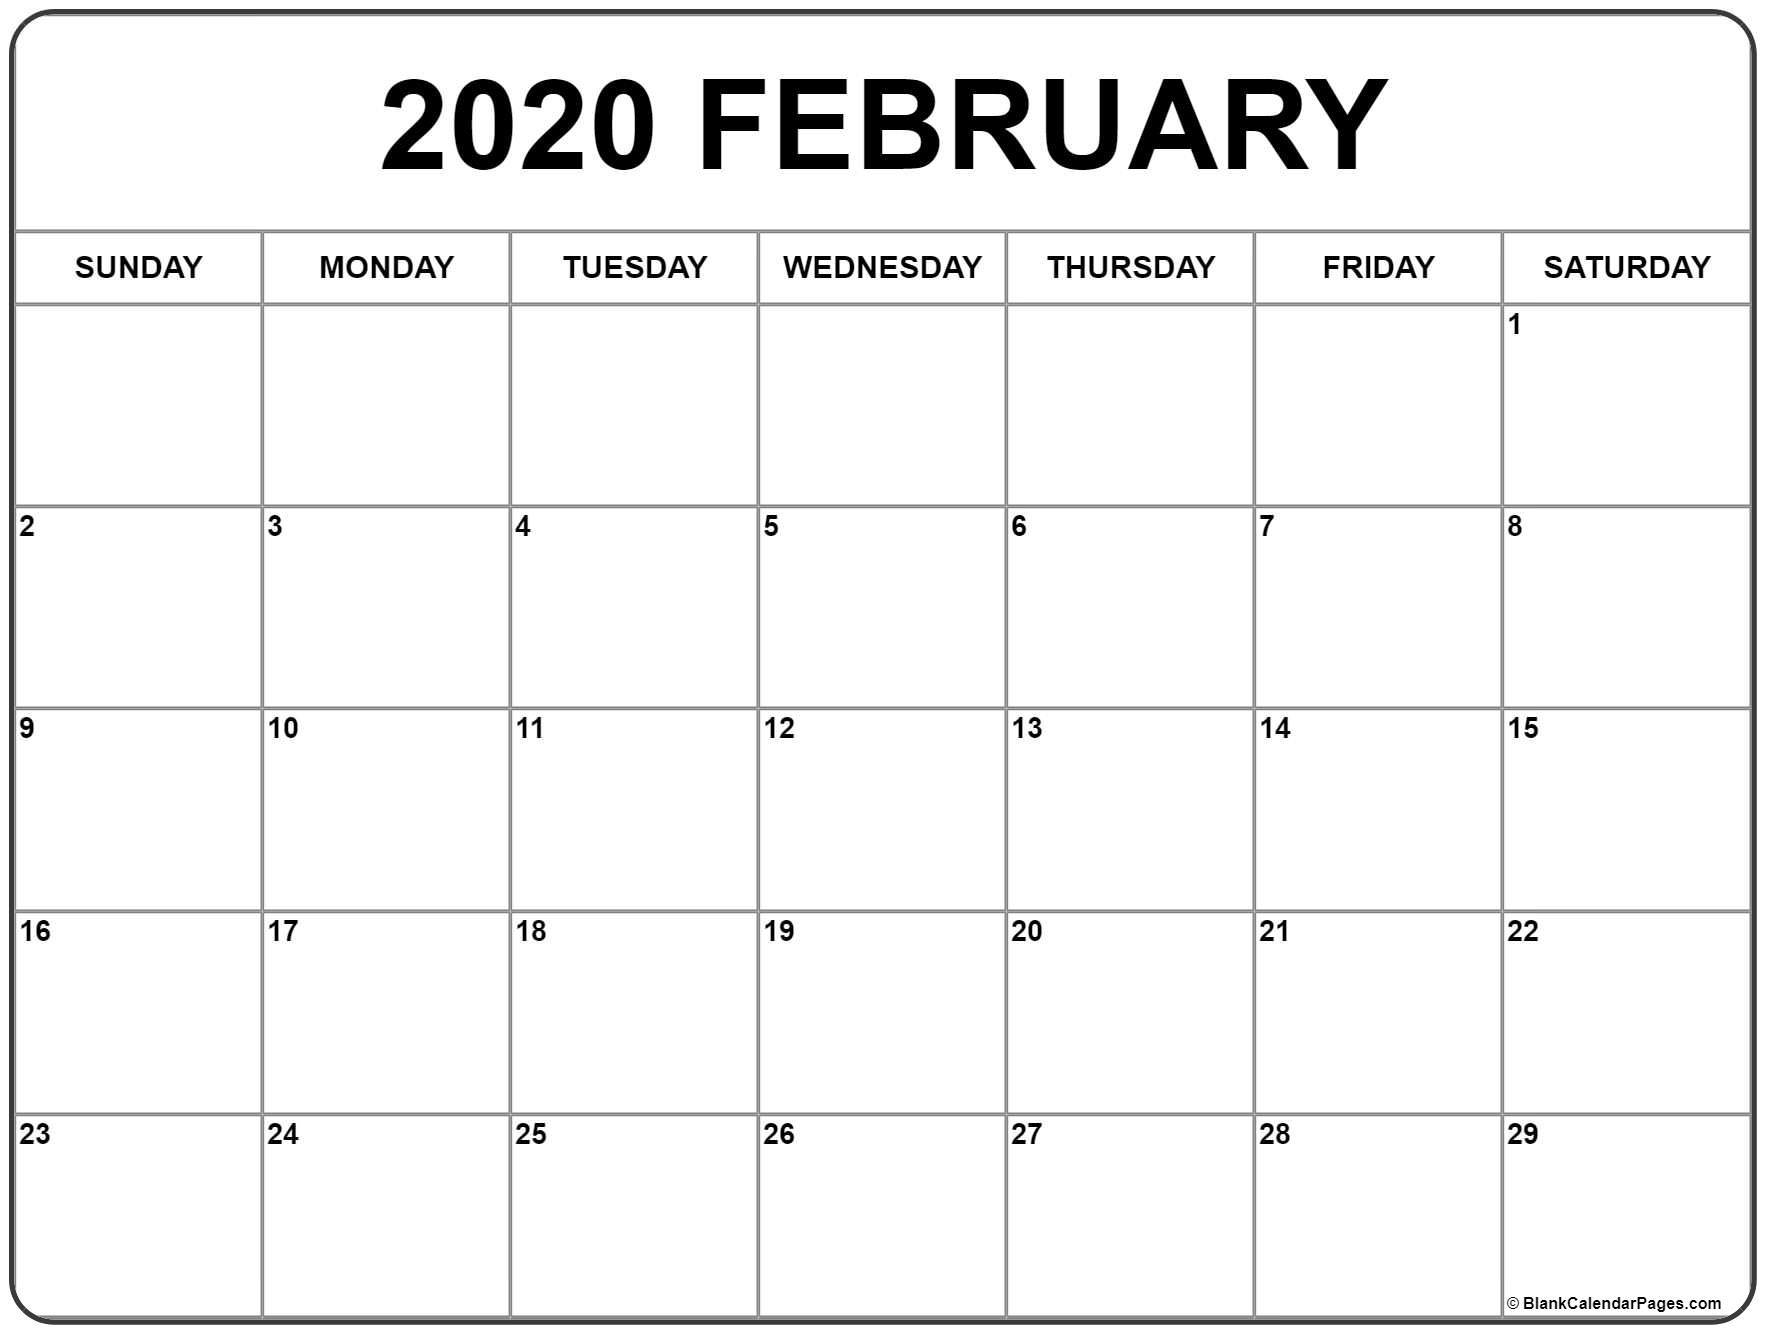 Feb 2020 Calendar Printable February 2020 Calendar